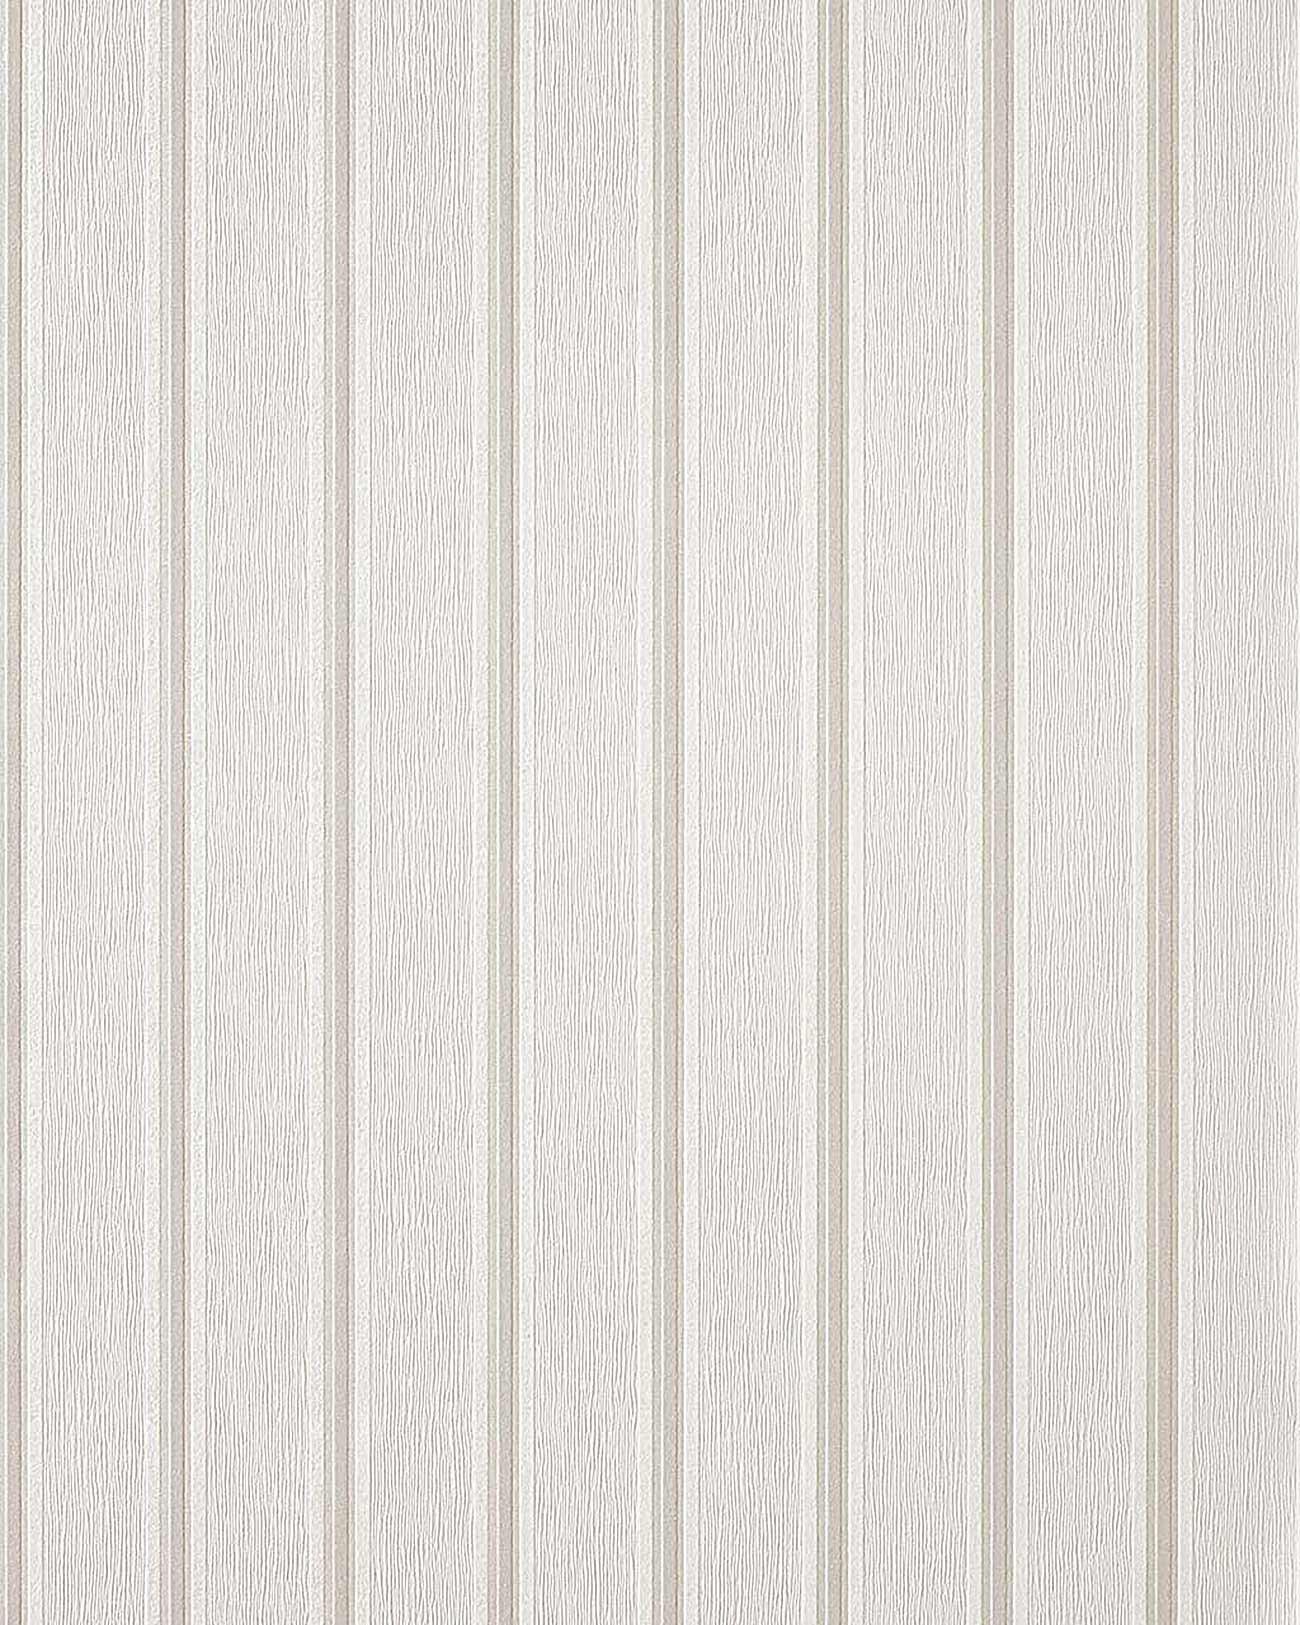 streifen tapete edem 112 30 stilvolle design tapete vinyltapete wei creme hell grau perlmutt. Black Bedroom Furniture Sets. Home Design Ideas